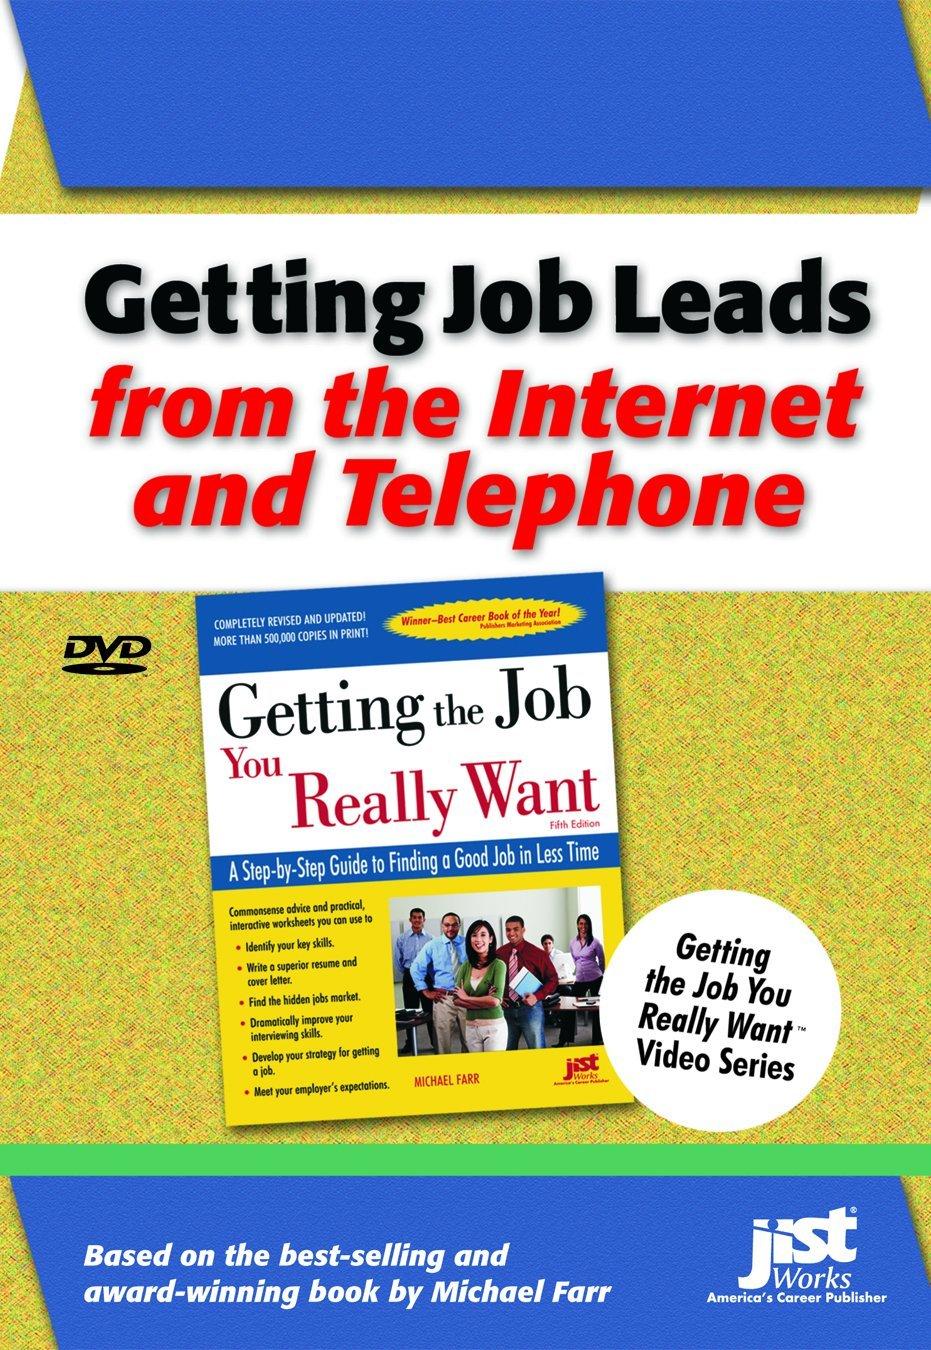 com getting job leads from the internet a a ddjw jdx com getting job leads from the internet a a ddjw jd164x movies tv